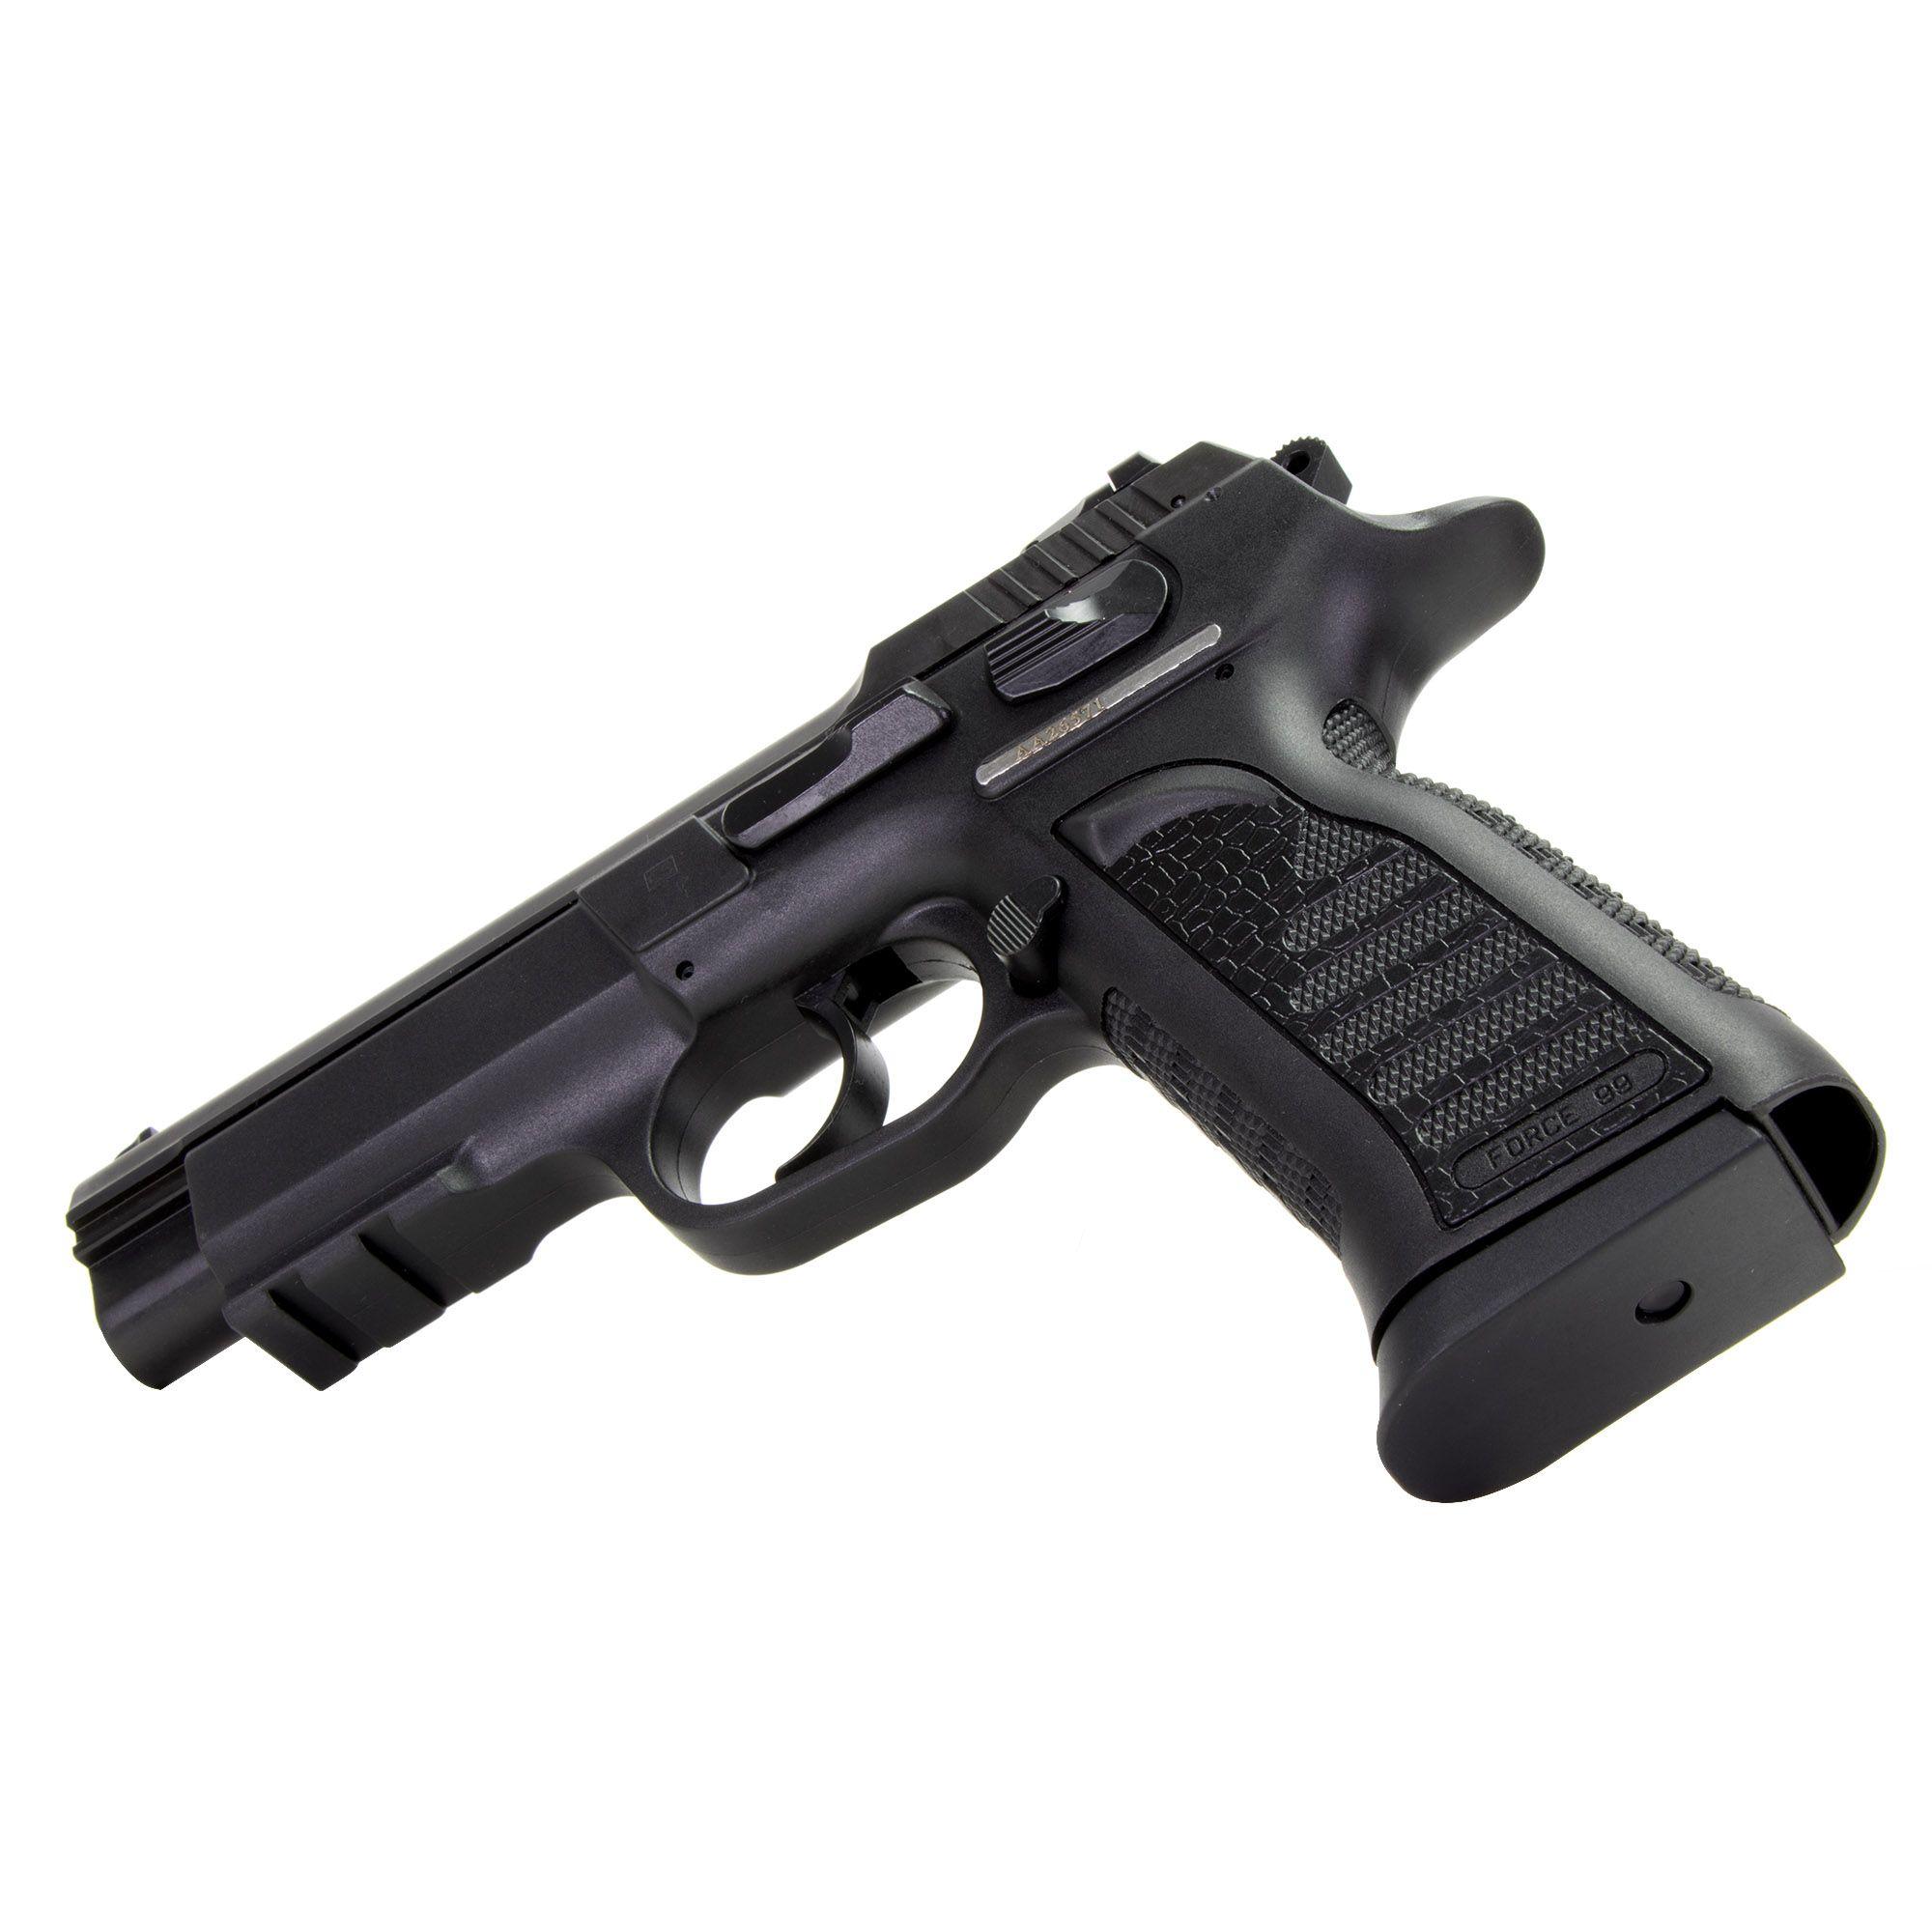 PRÉ VENDA - Pistola Tanfoglio FT9 FS (Full Size) Calibre 380 ACP - Venda Exclusiva Para CAC